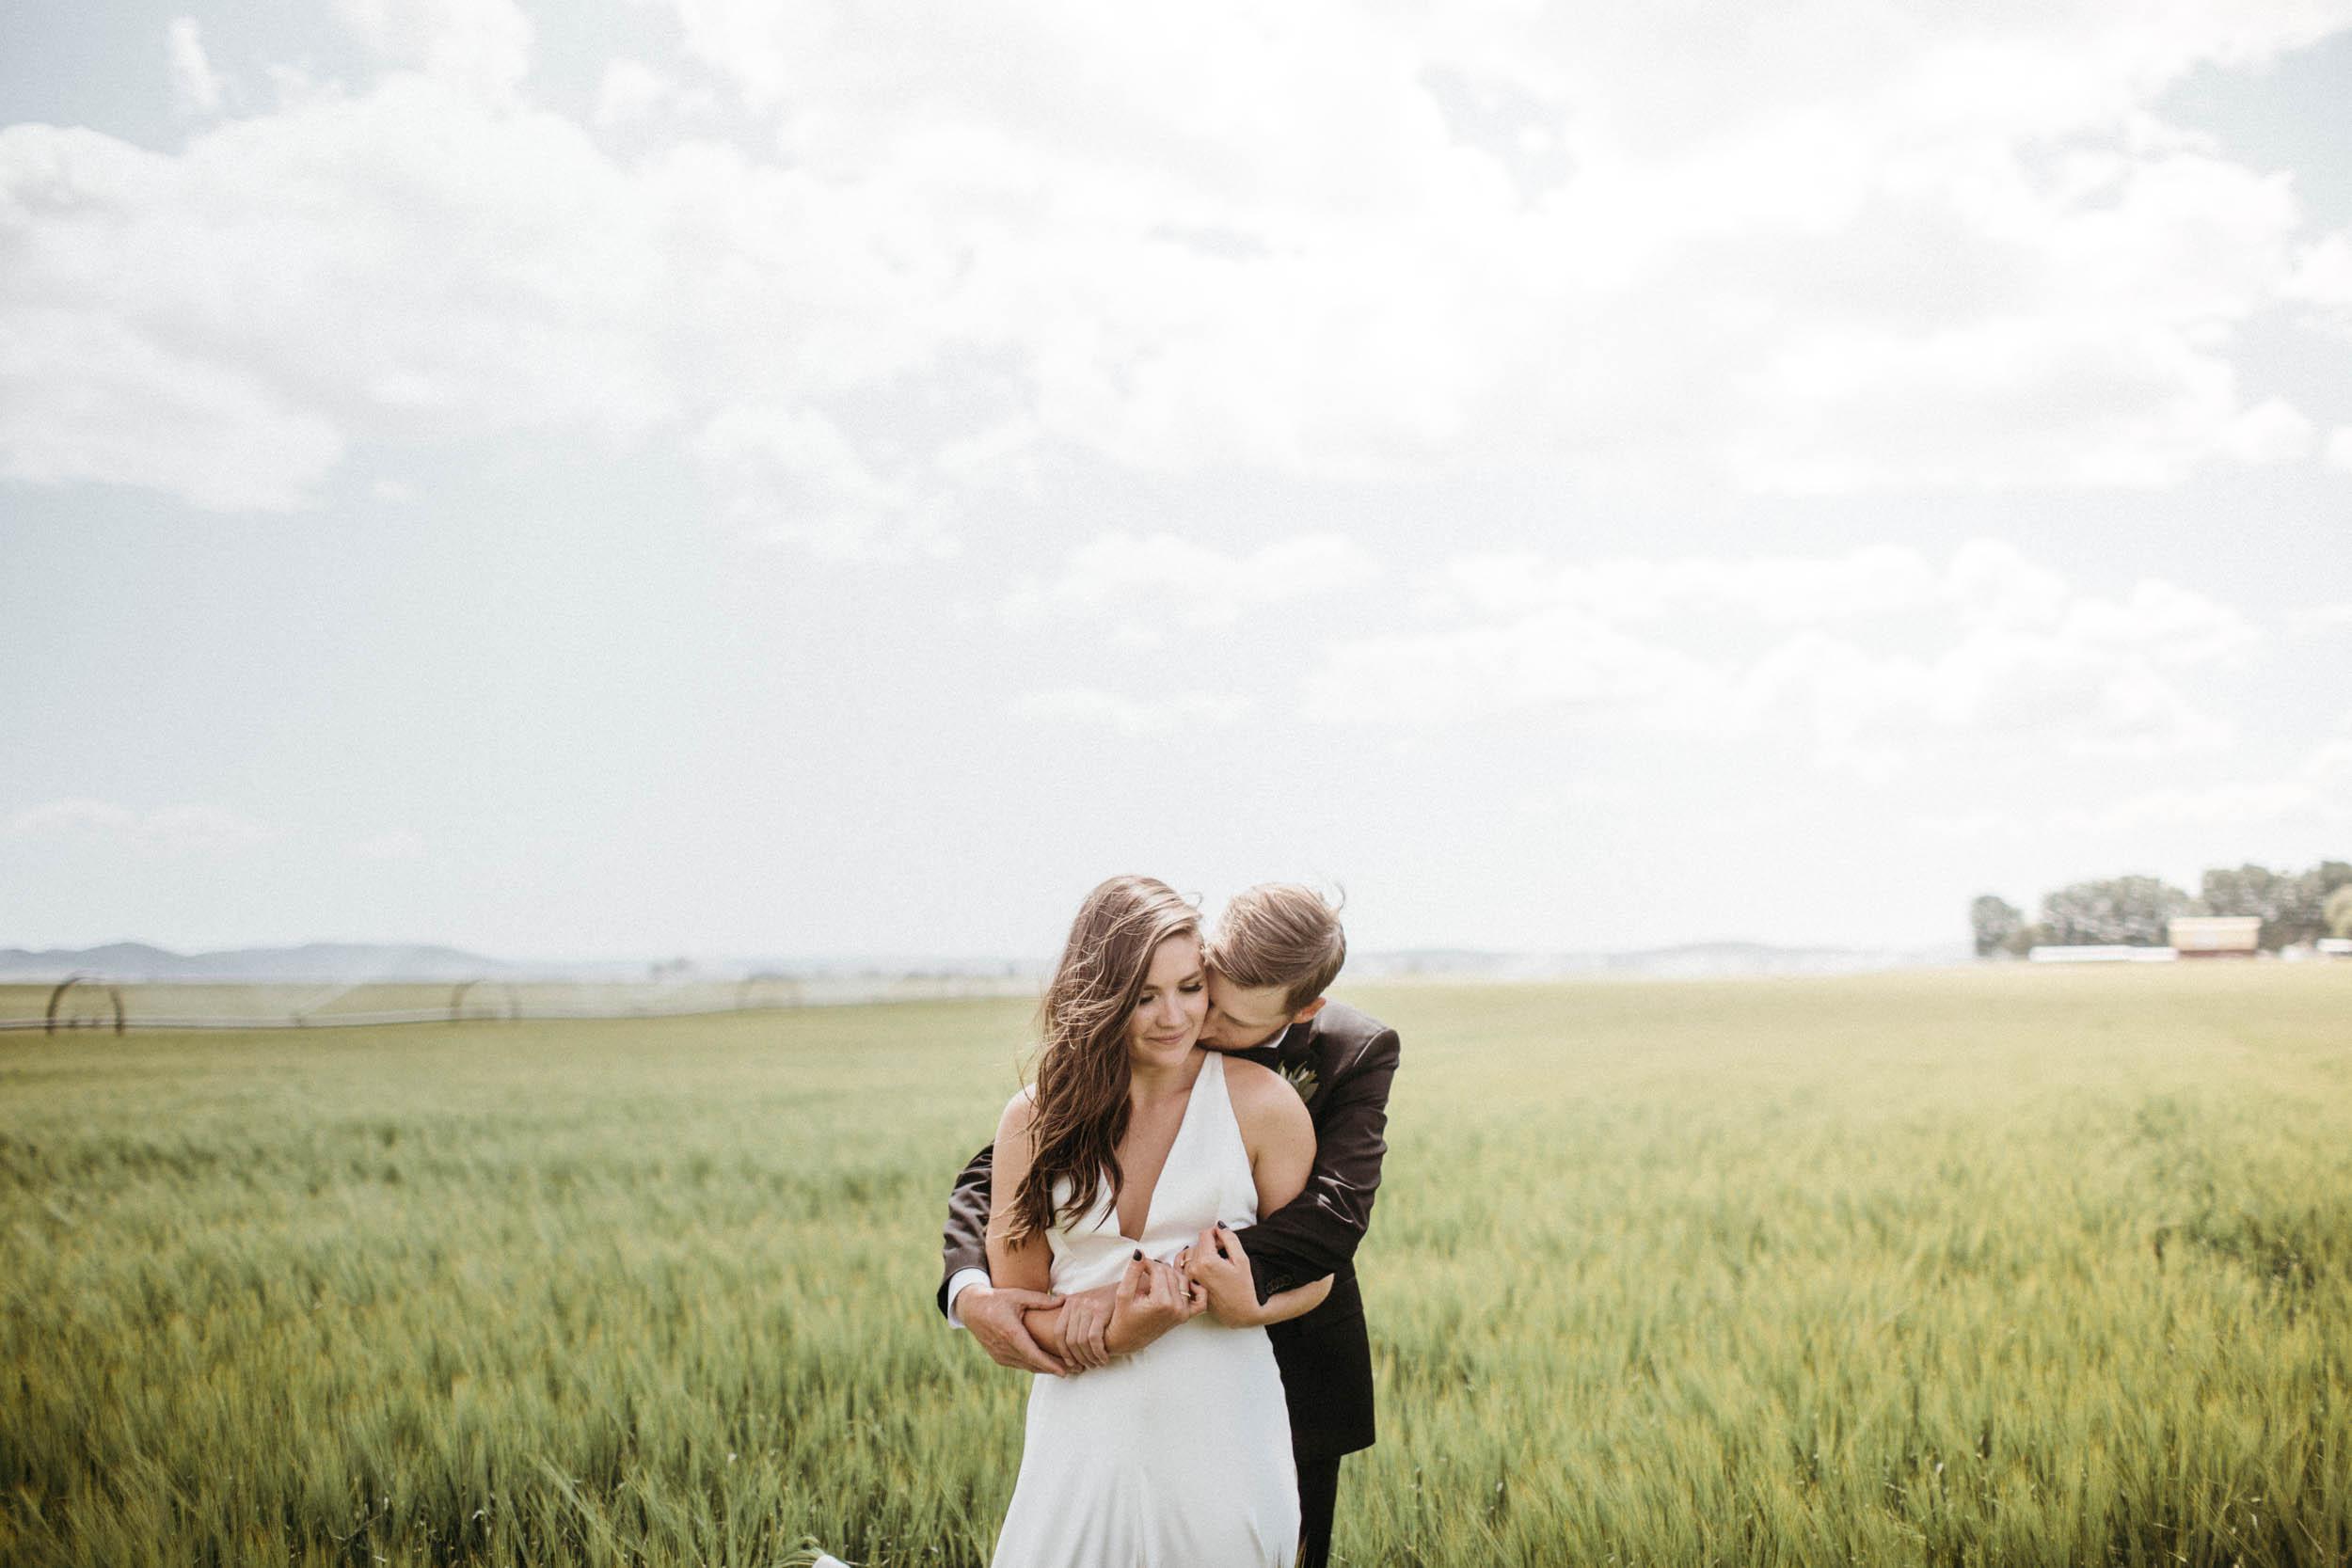 Danny & Mia | Baseline Road Wedding